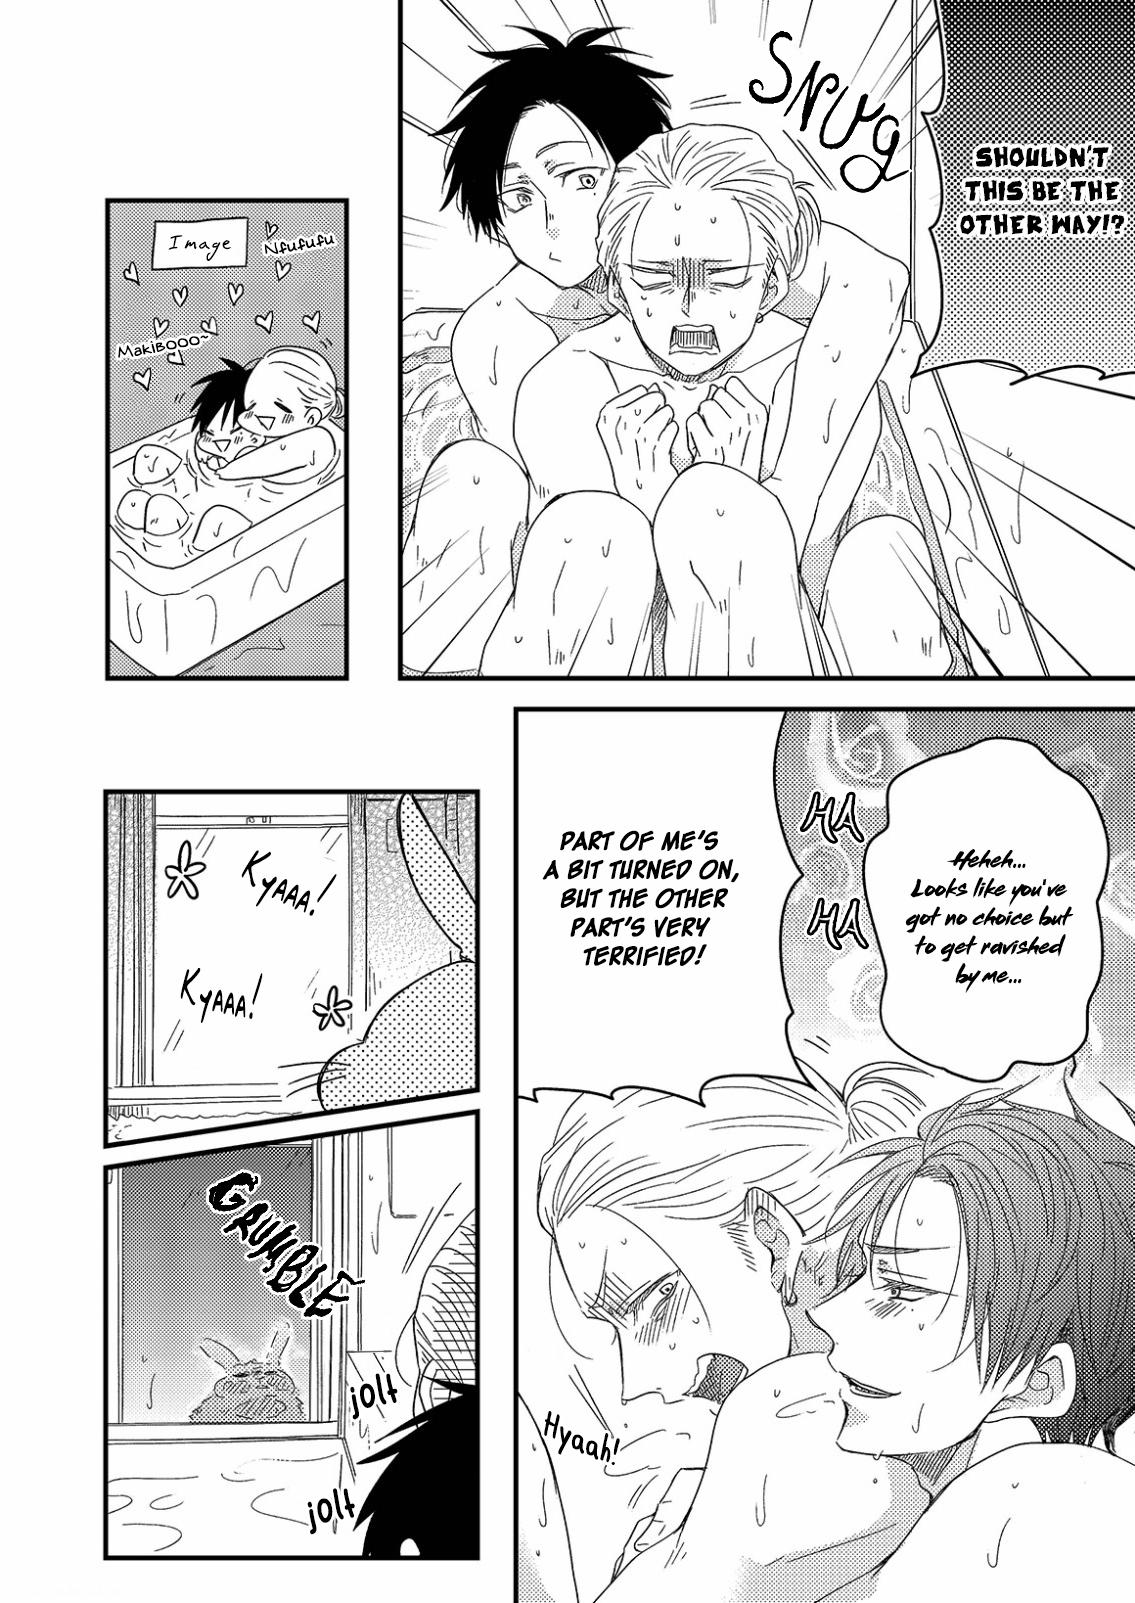 Shiawase Gohan - Maki to Hanazawa - Chapter 7